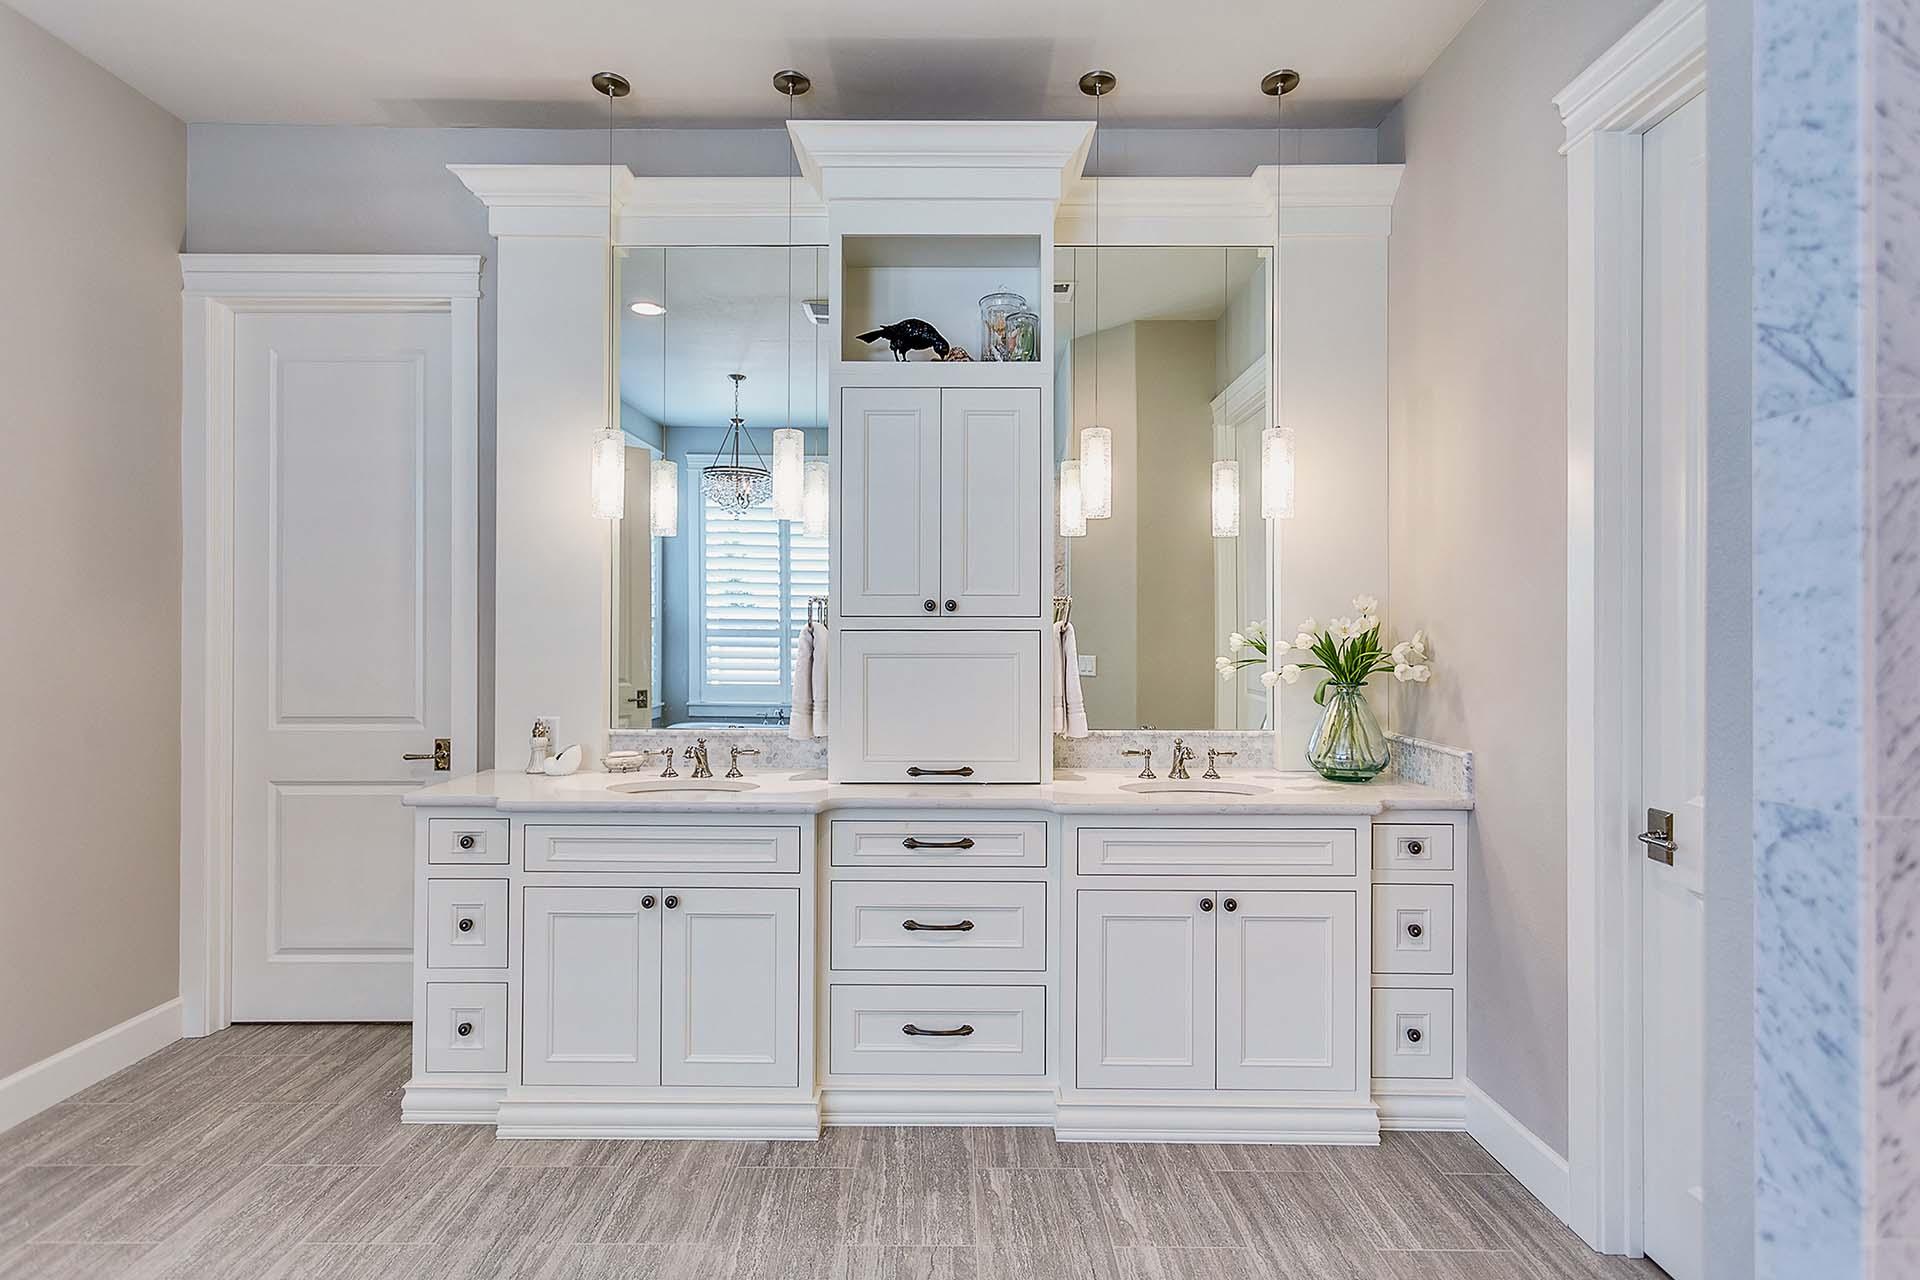 White Inset Style Vanity